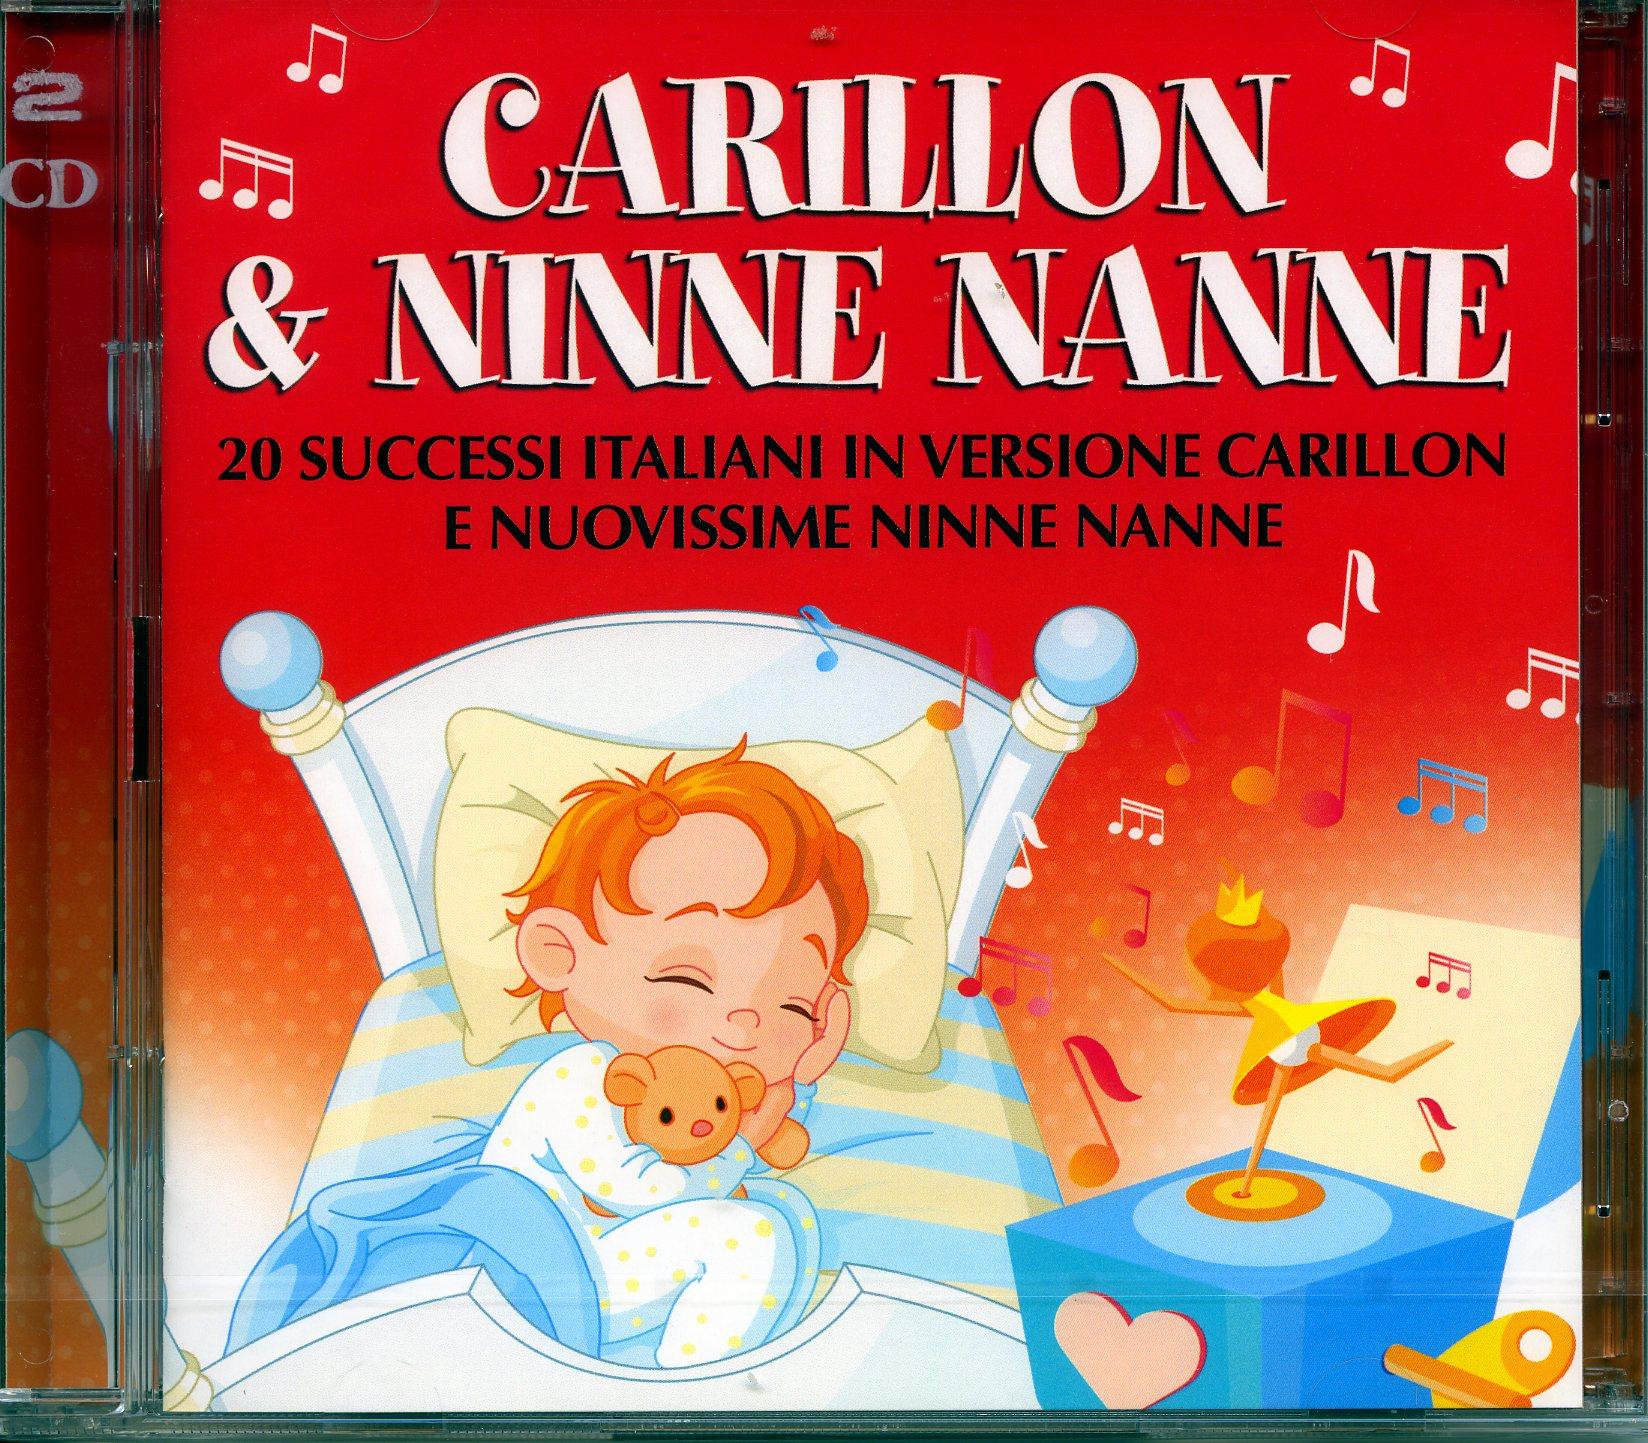 CARILLON & NINNE NANNE